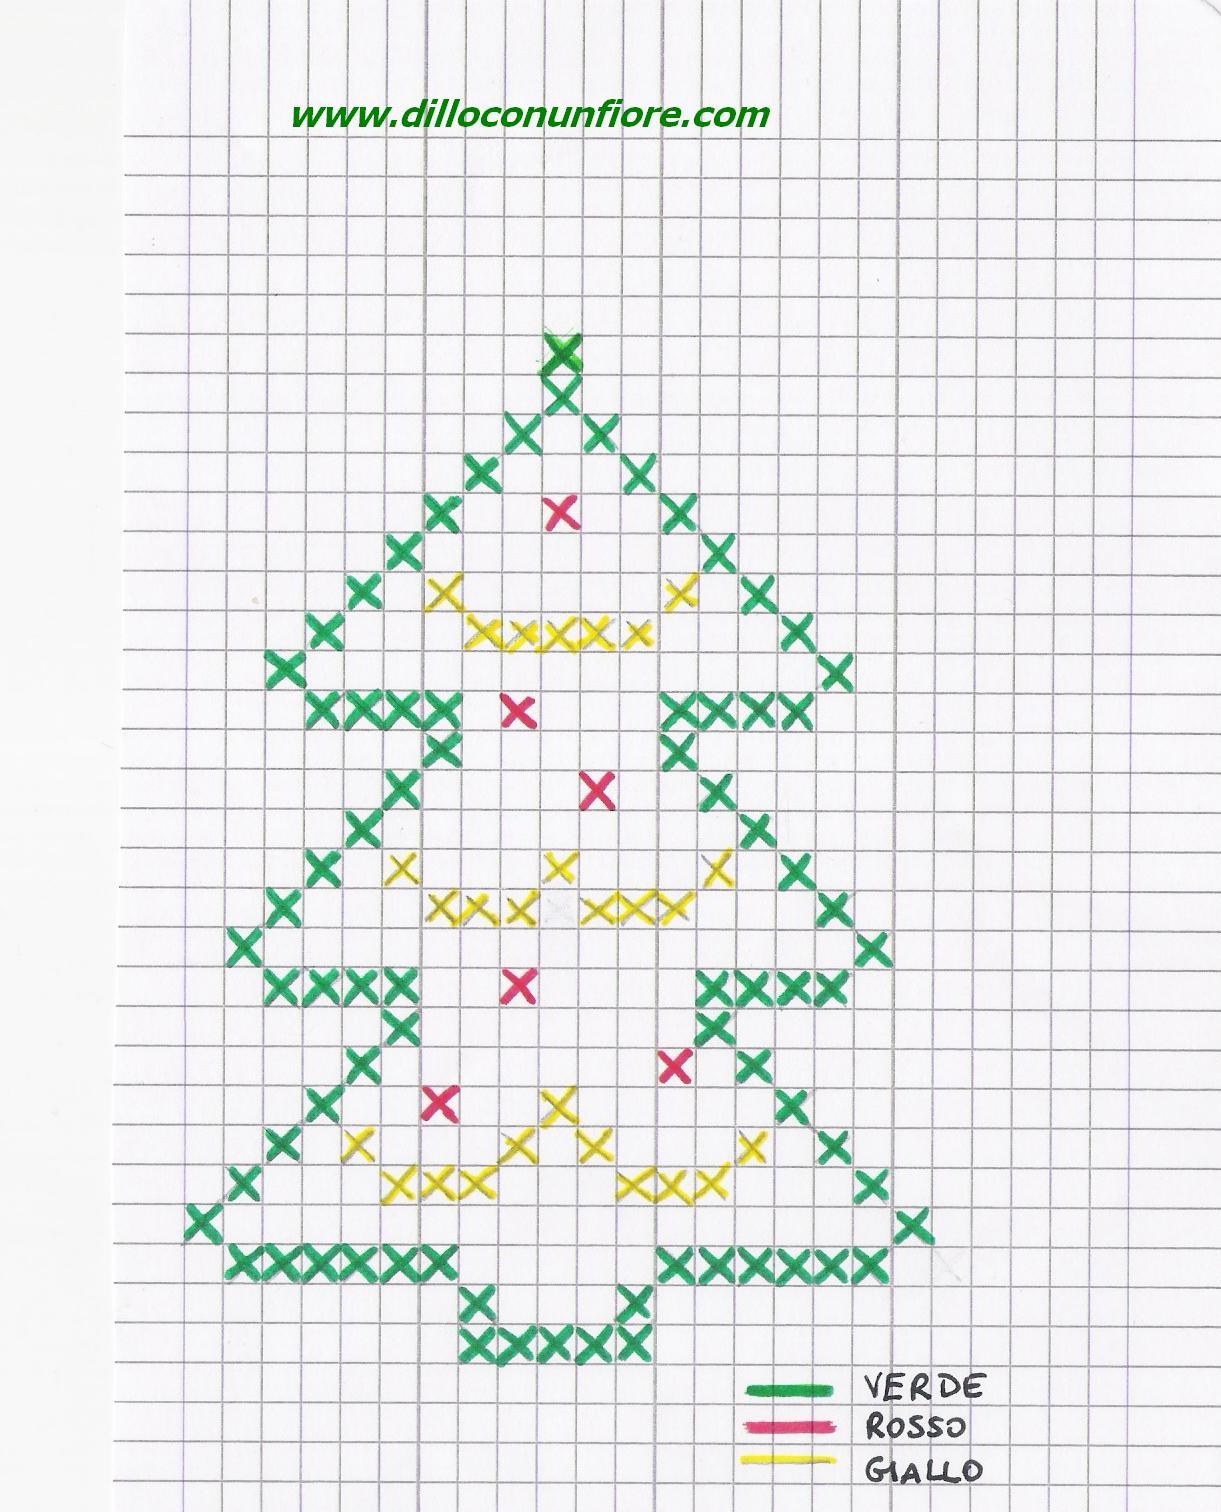 Biglietti Di Natale A Punto Croce.Schemi Punto Croce A Tema Floreale Ricami Per Natale Gratis Idee